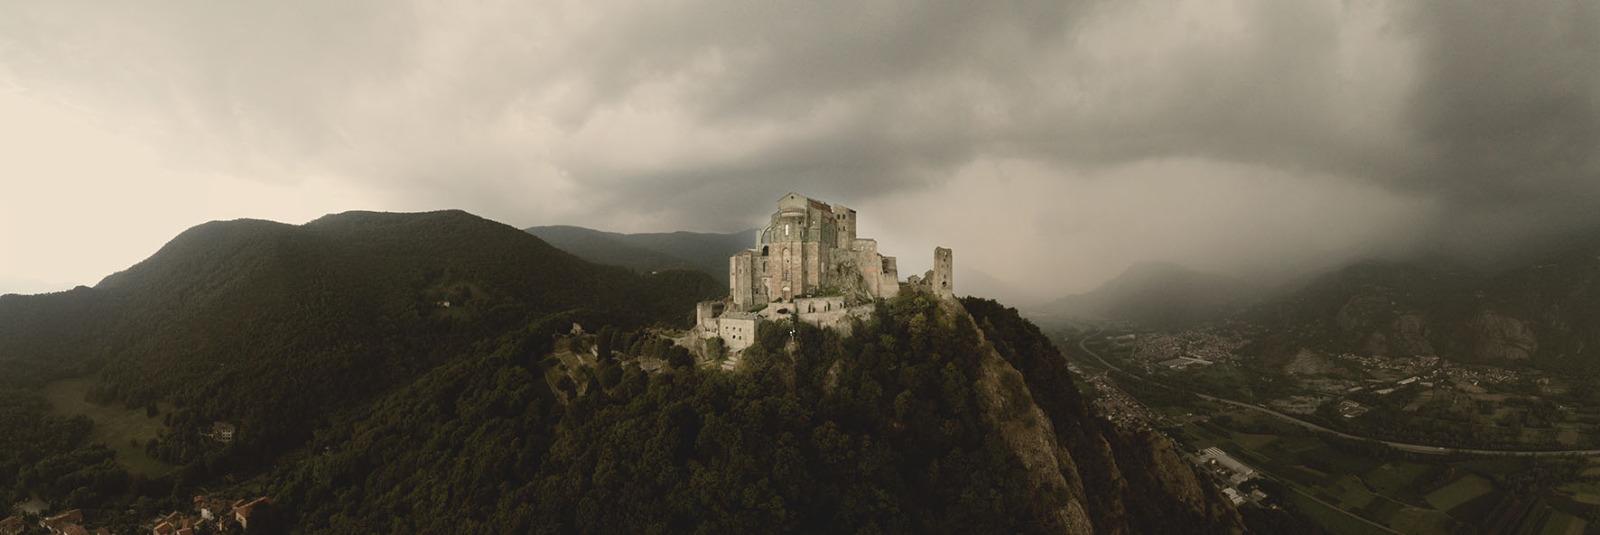 Panorama Sacra di San Michele - Foto Claudio Allais